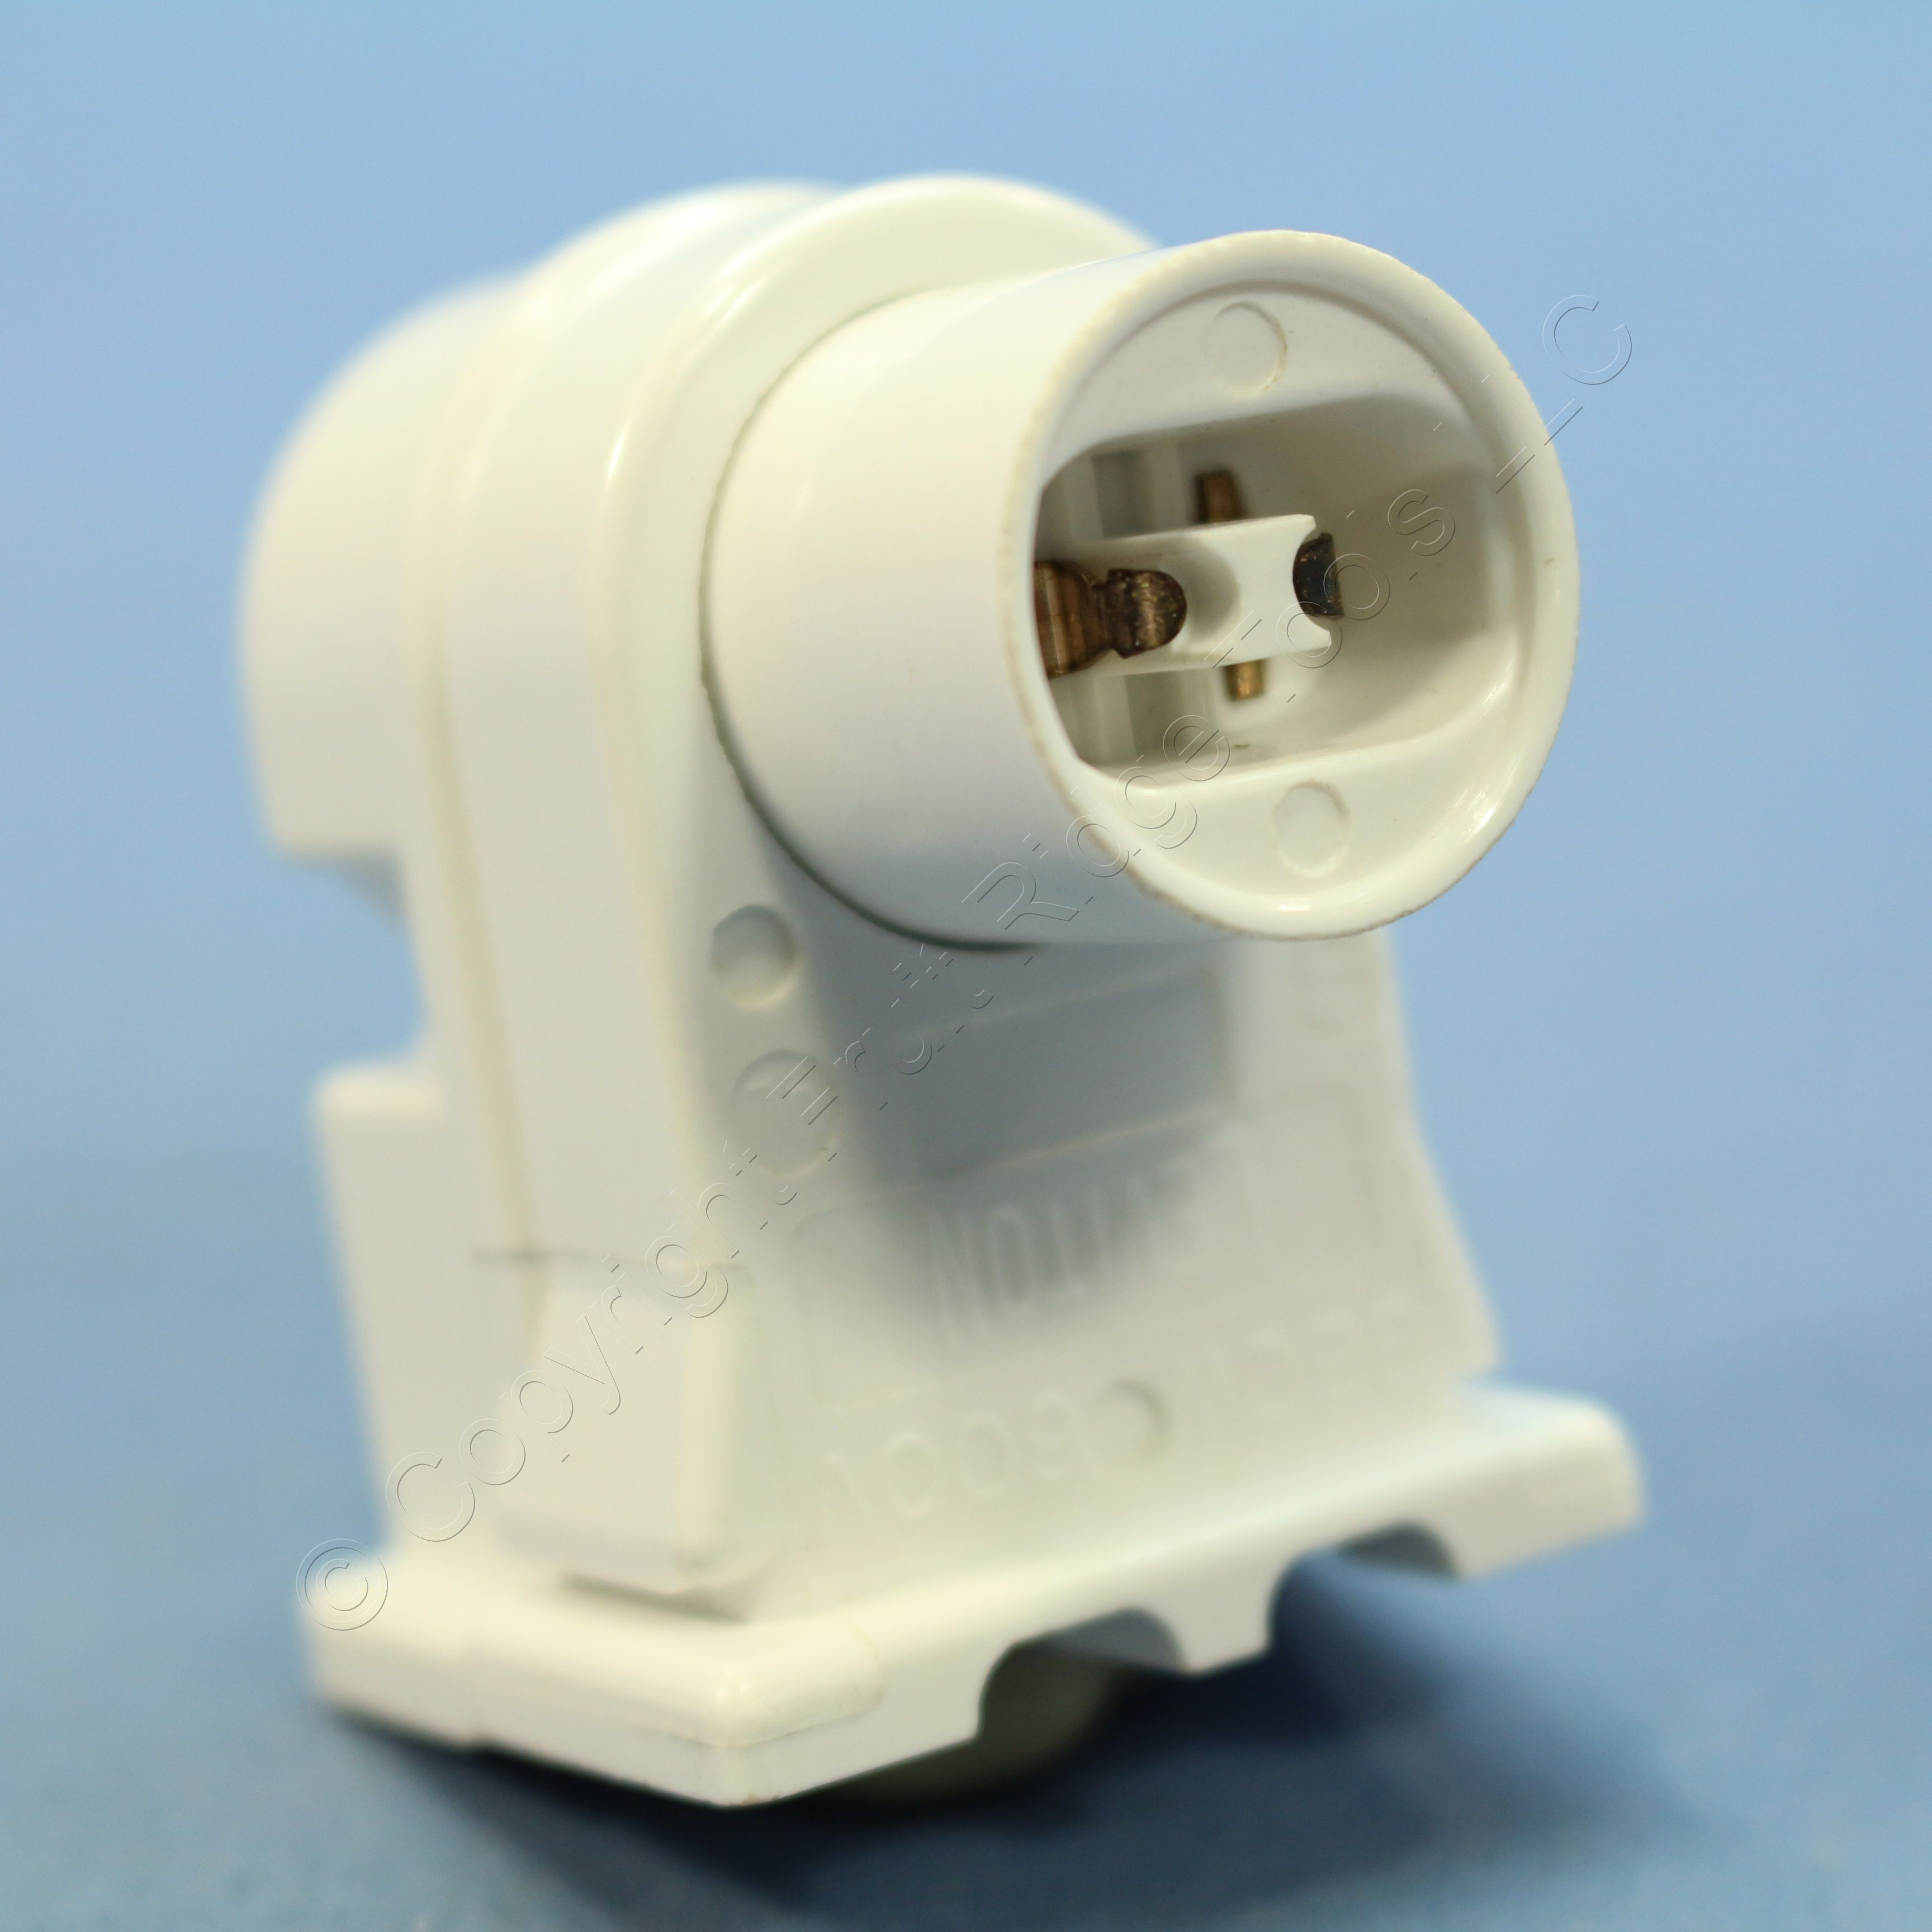 Leviton High Output T8 T12 Fluorescent Light Lamp Holder